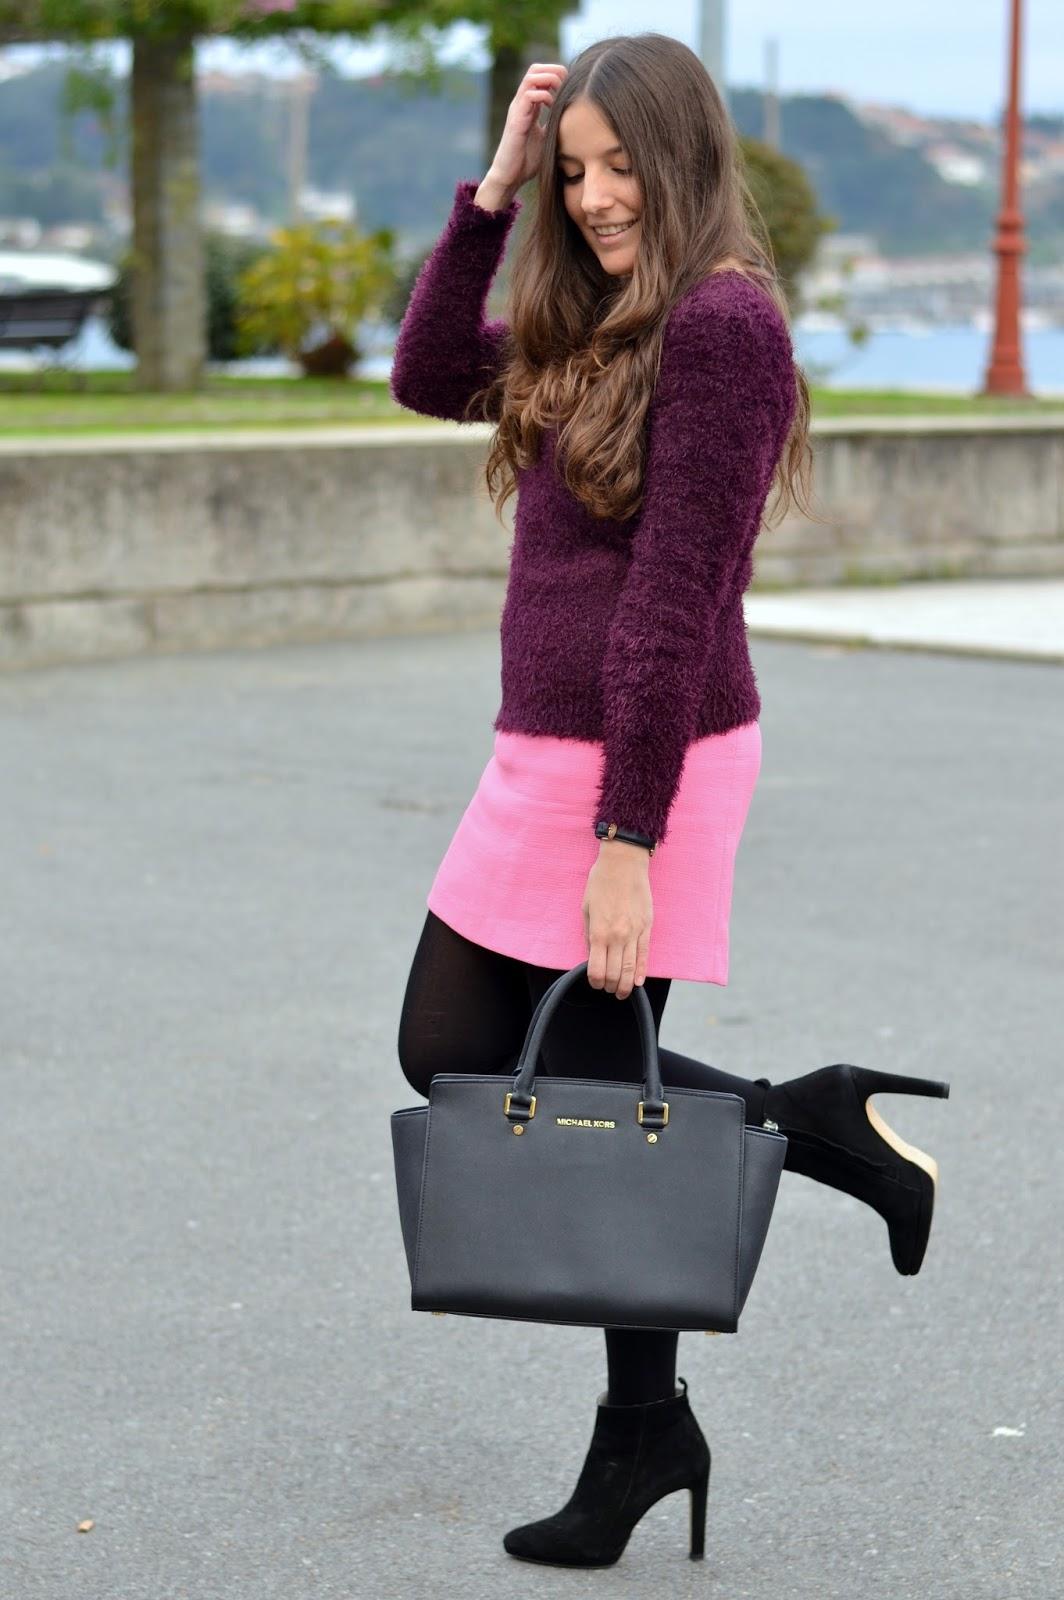 H&M purple sweater, pink skirt, michael kors selma